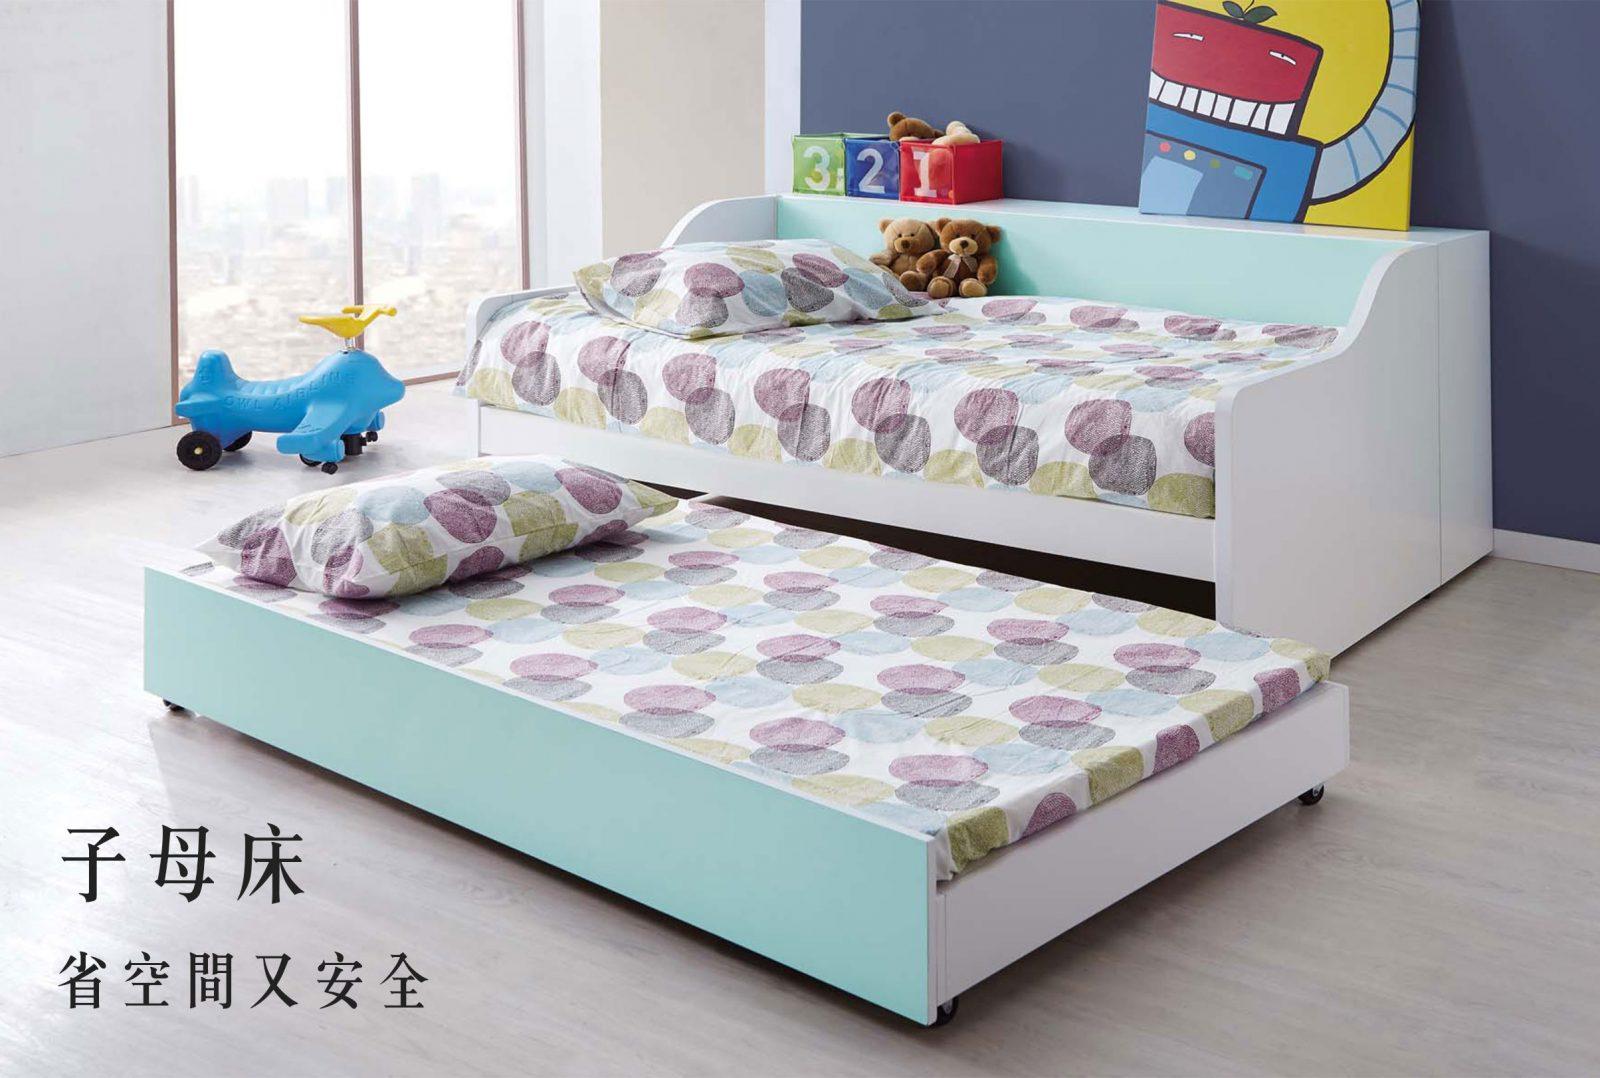 UR Design 床架 子母床